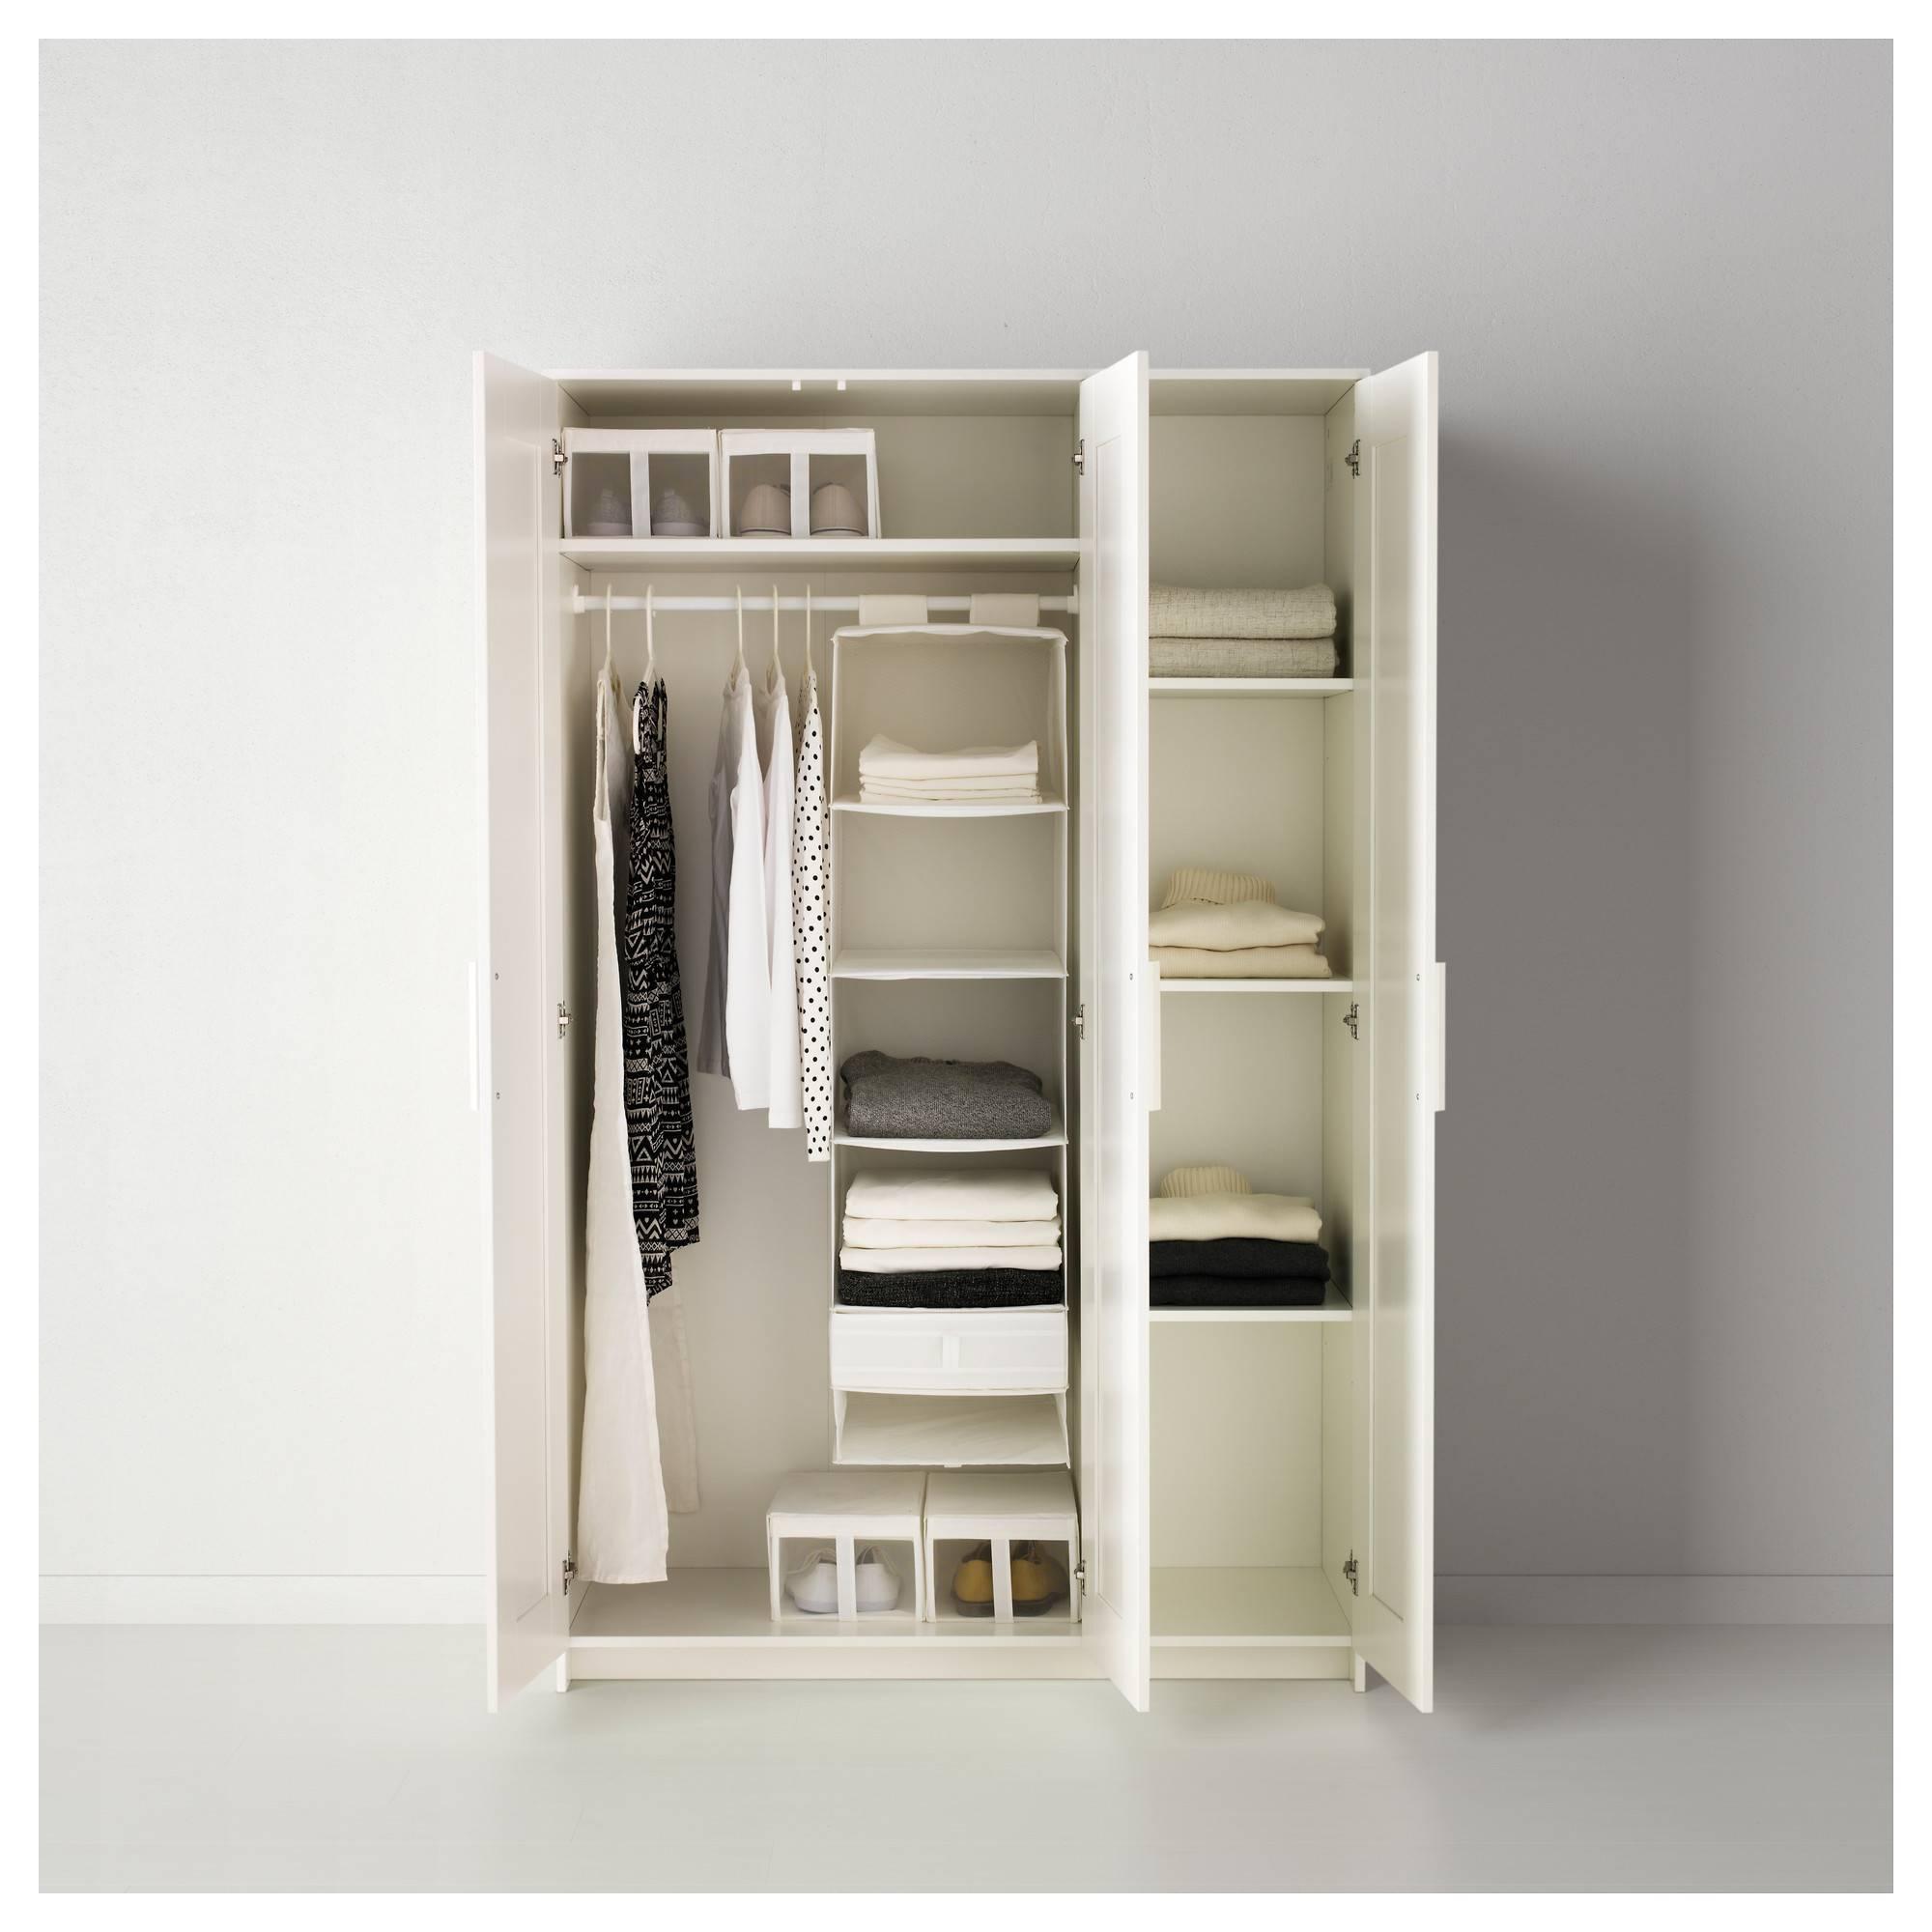 Brimnes Wardrobe With 3 Doors - White - Ikea in Three Door Mirrored Wardrobes (Image 4 of 15)